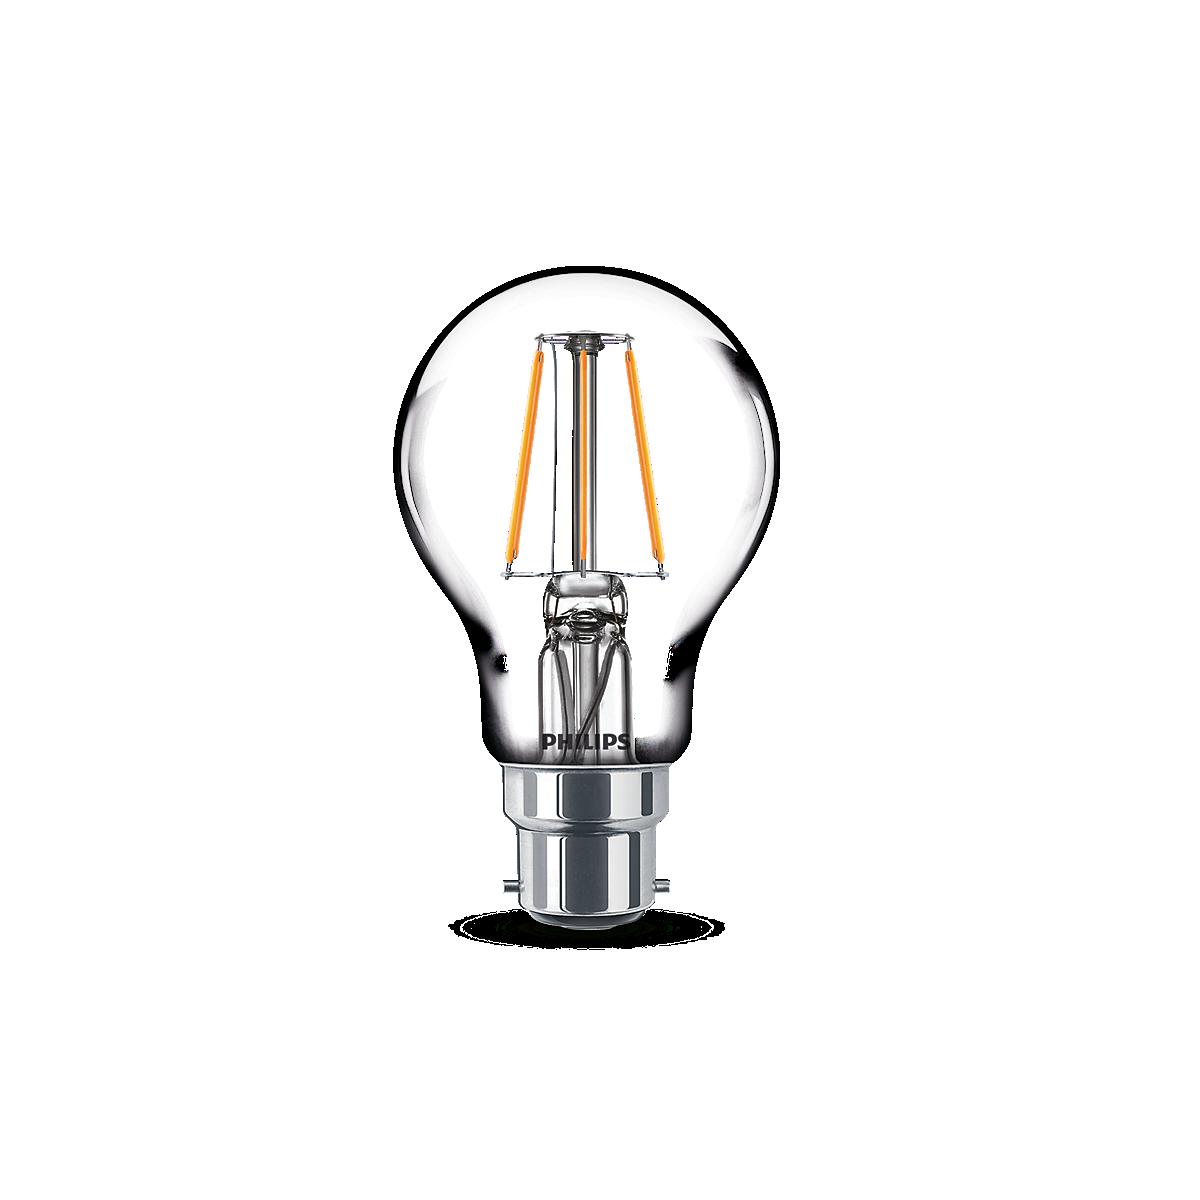 LED Velas y reflejo metálico